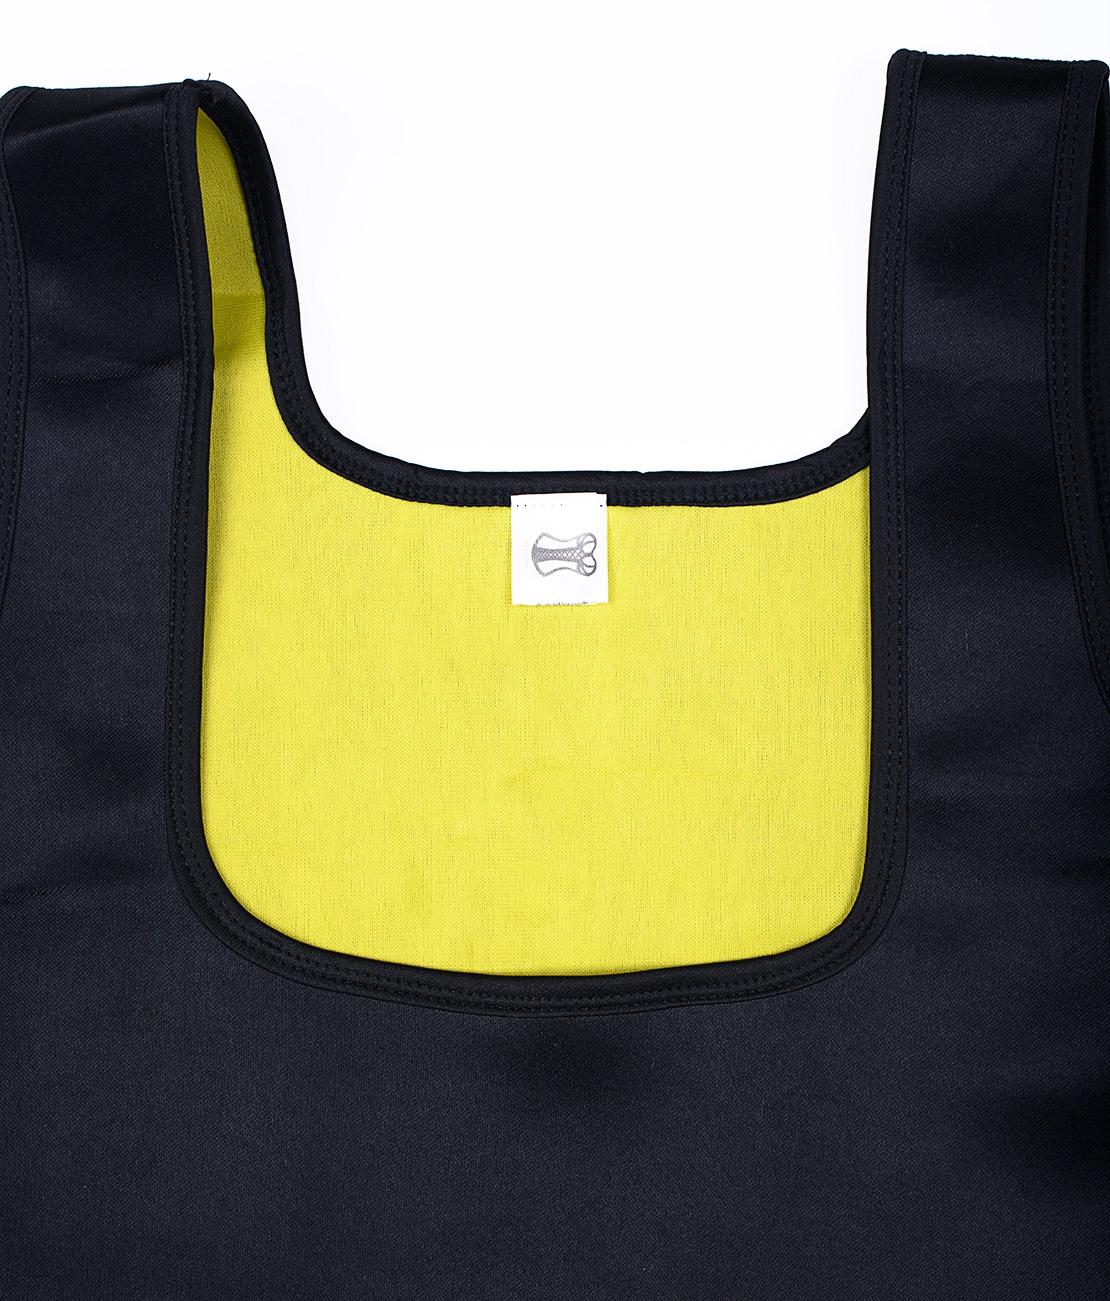 T-Shirt de sudation Noir Packshot Detail 1